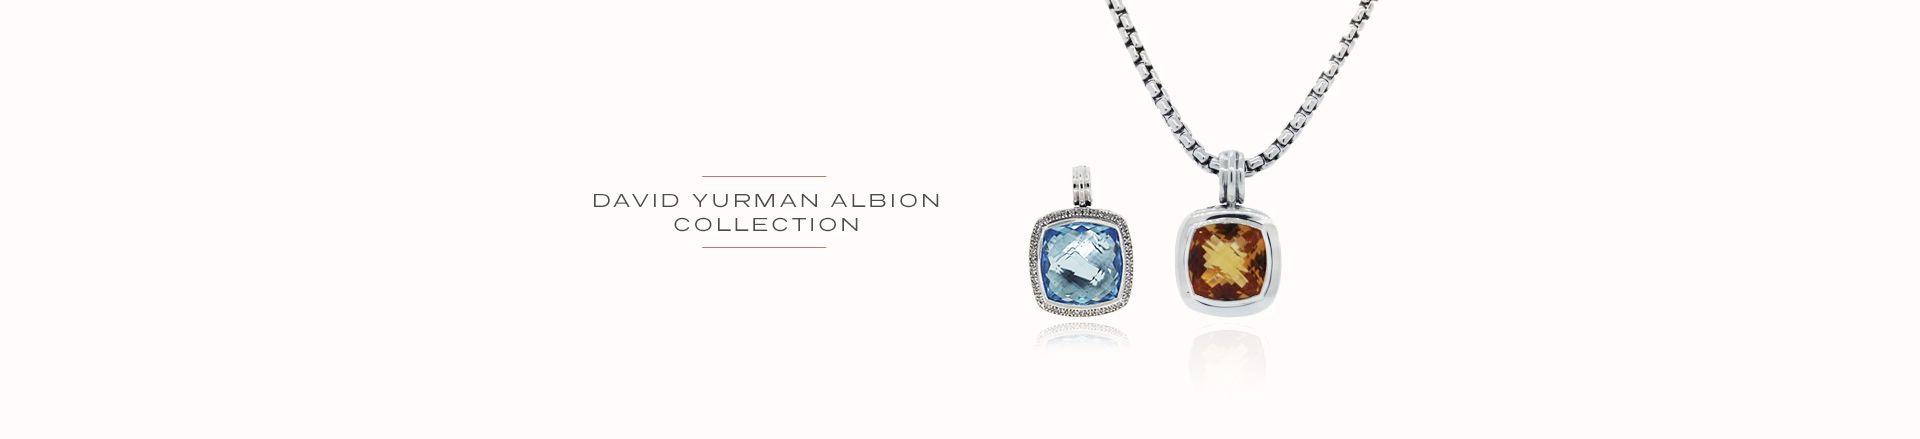 David Yurman Albion Collection